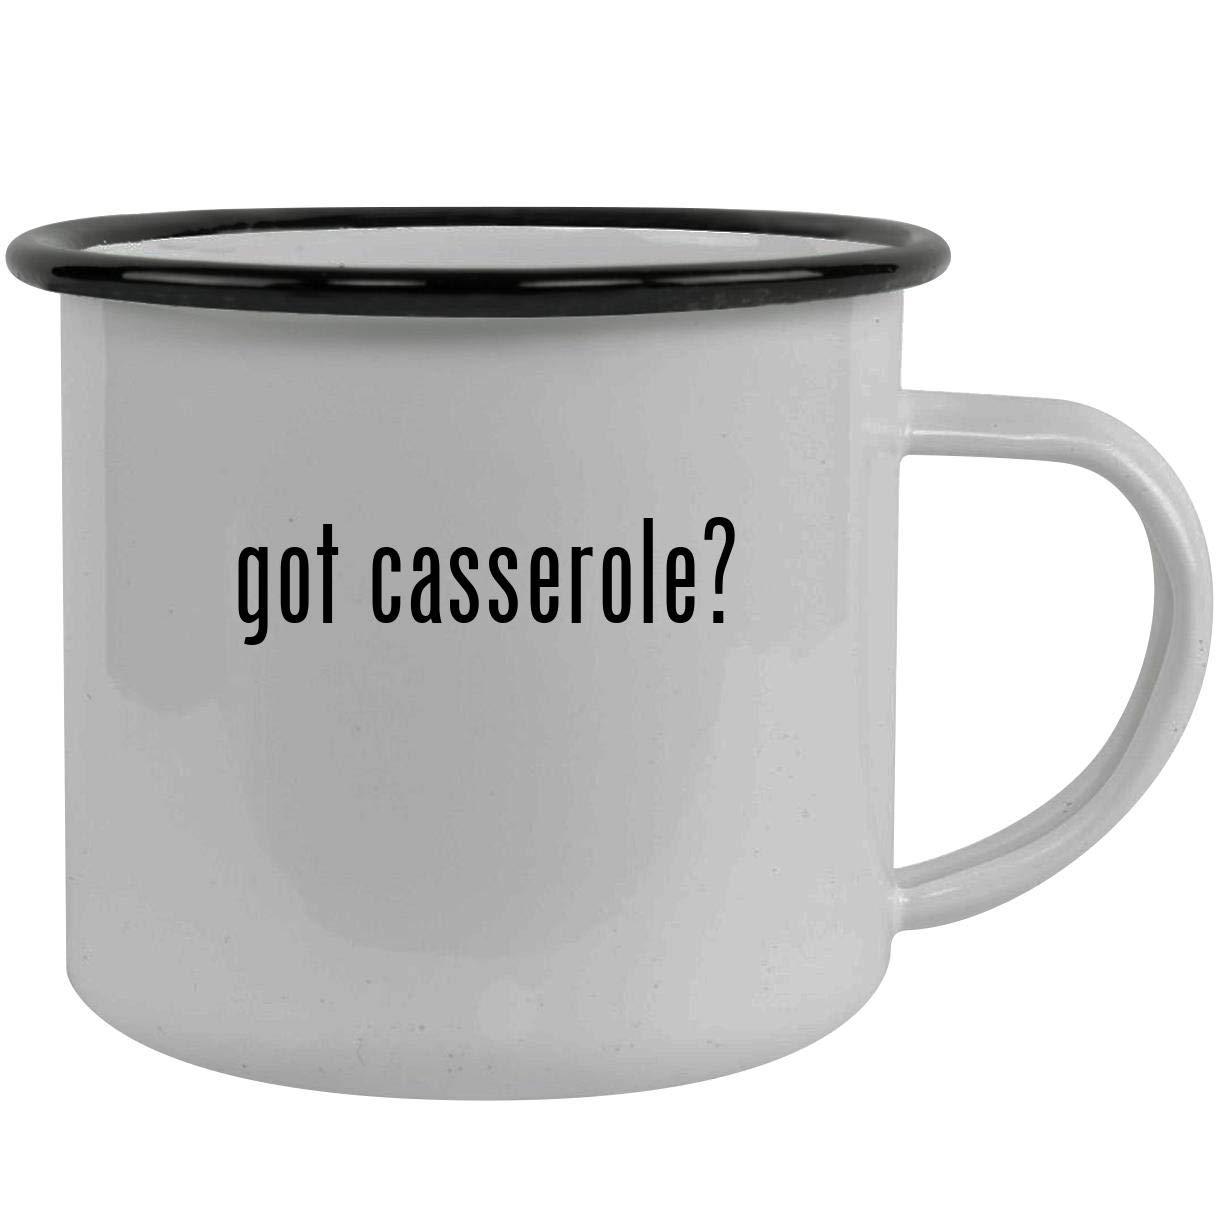 got casserole? - Stainless Steel 12oz Camping Mug, Black